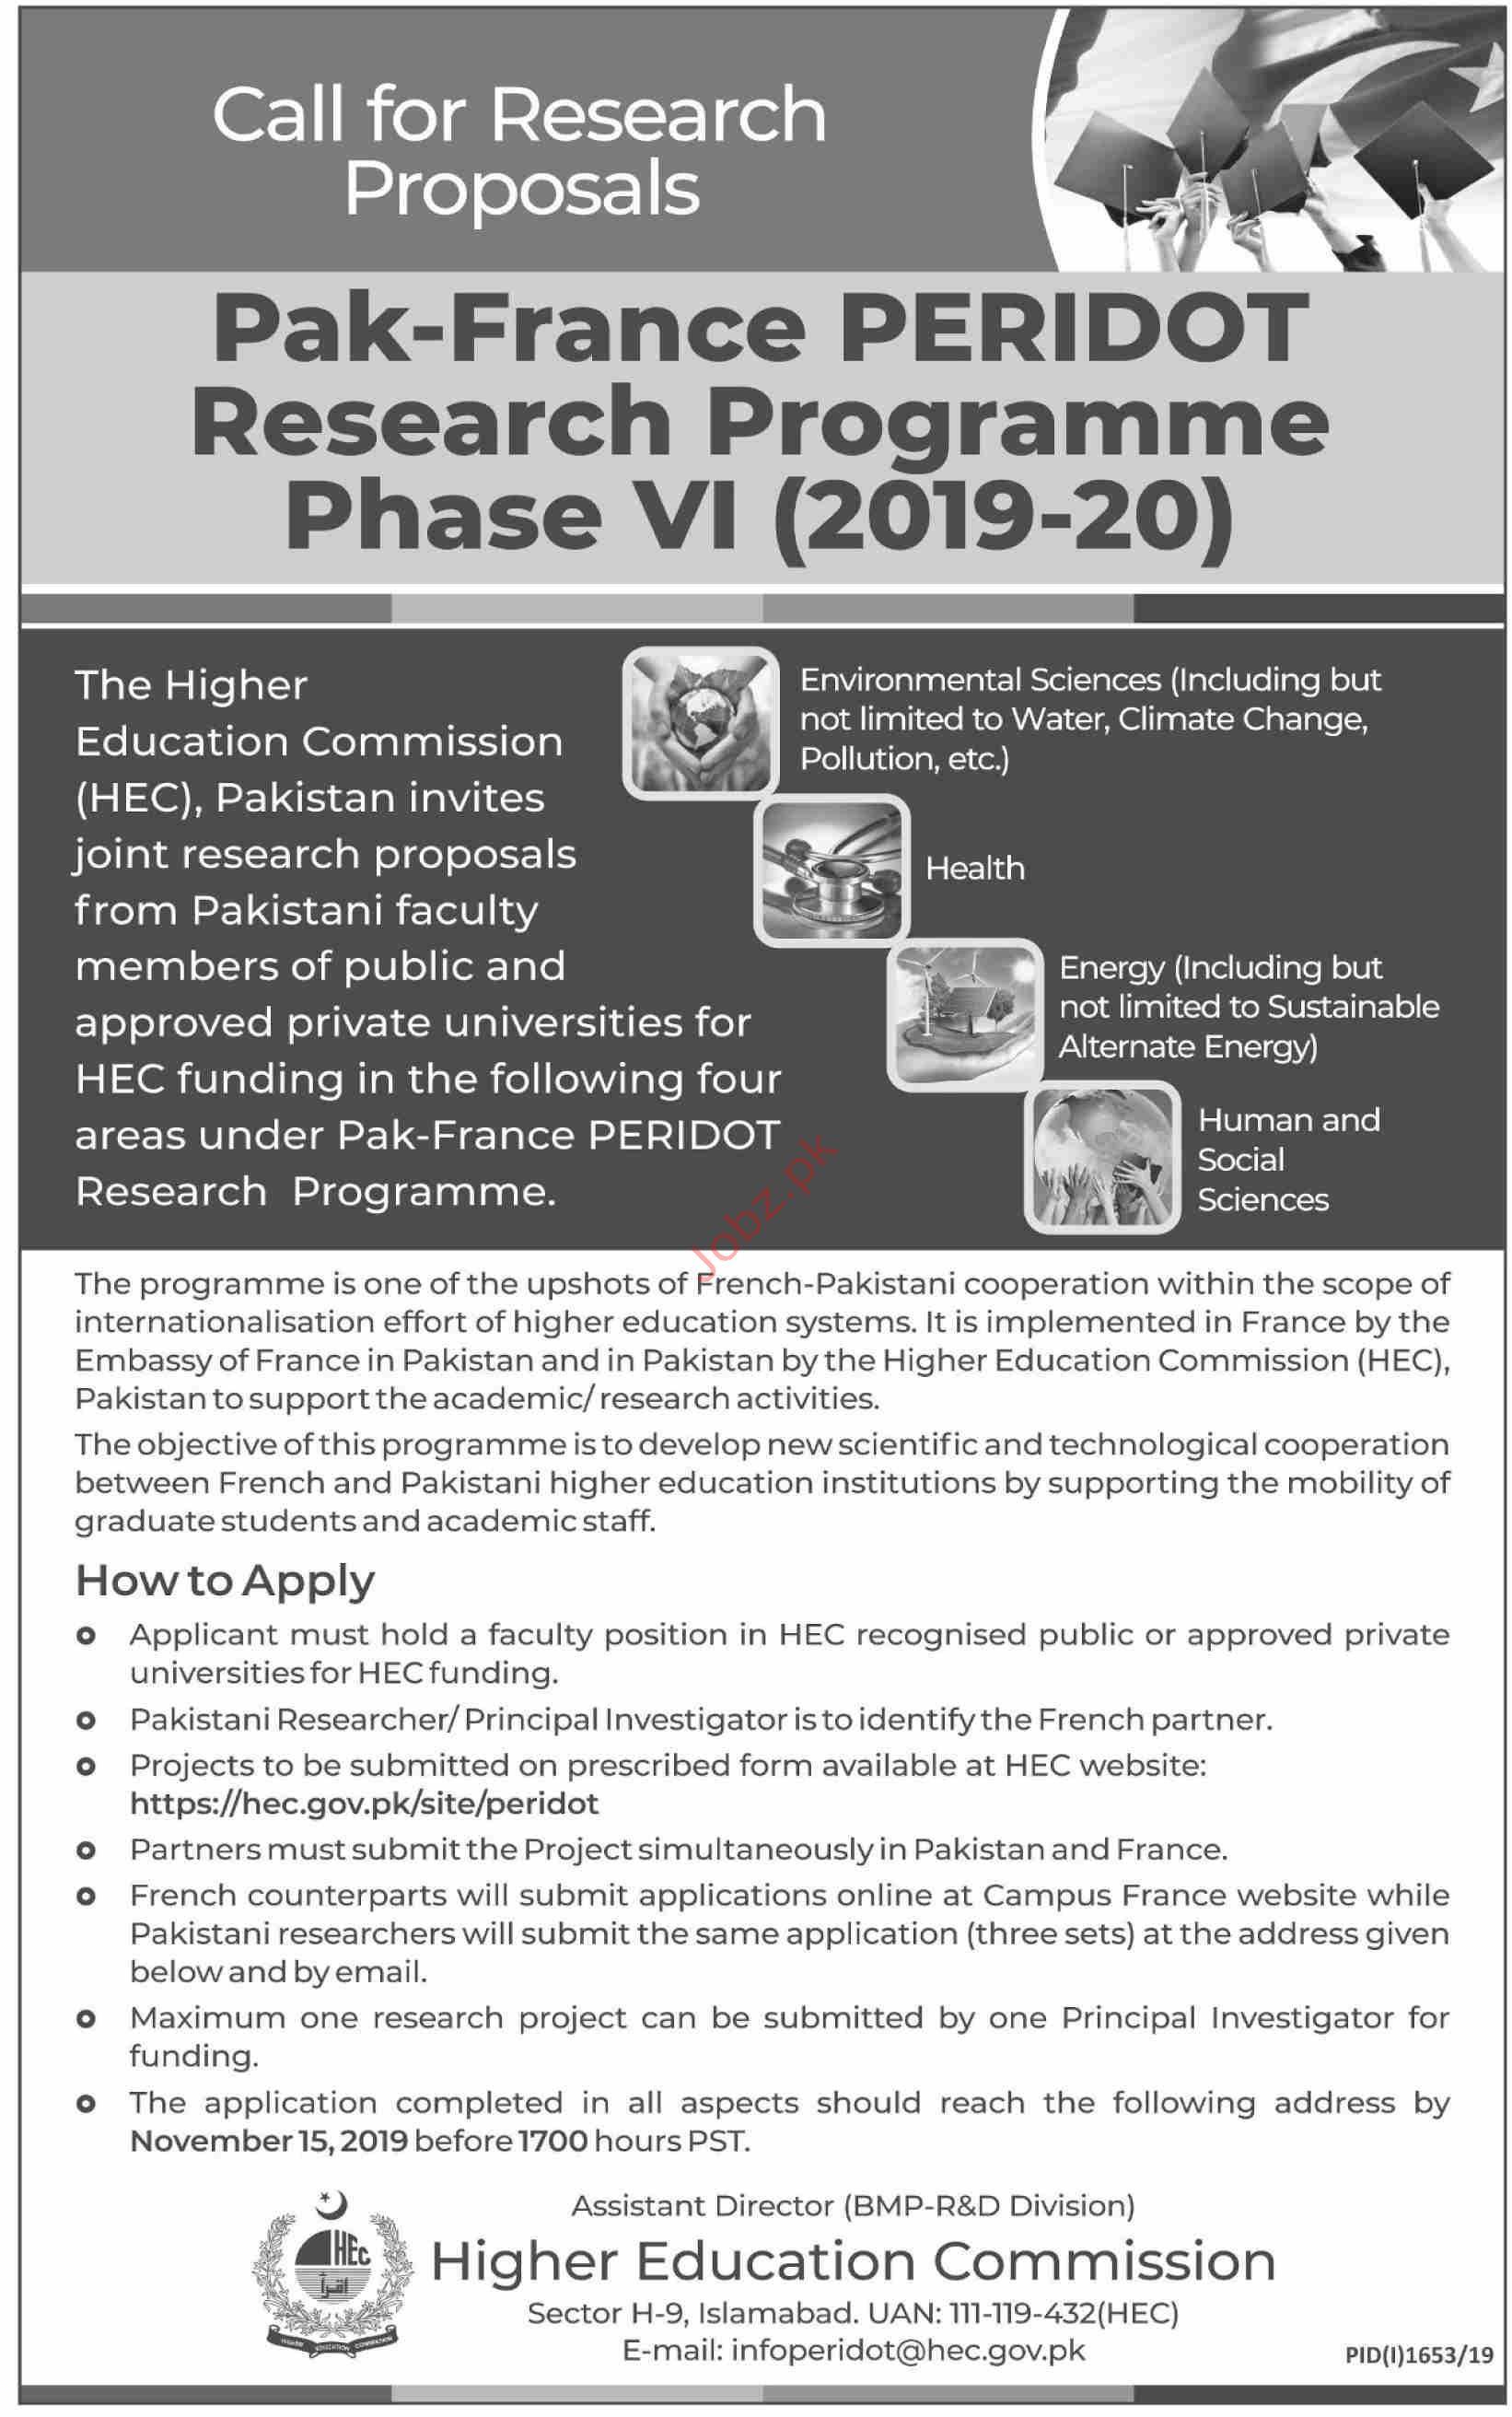 Pak France Peridot Research Programme HEC Islamabad